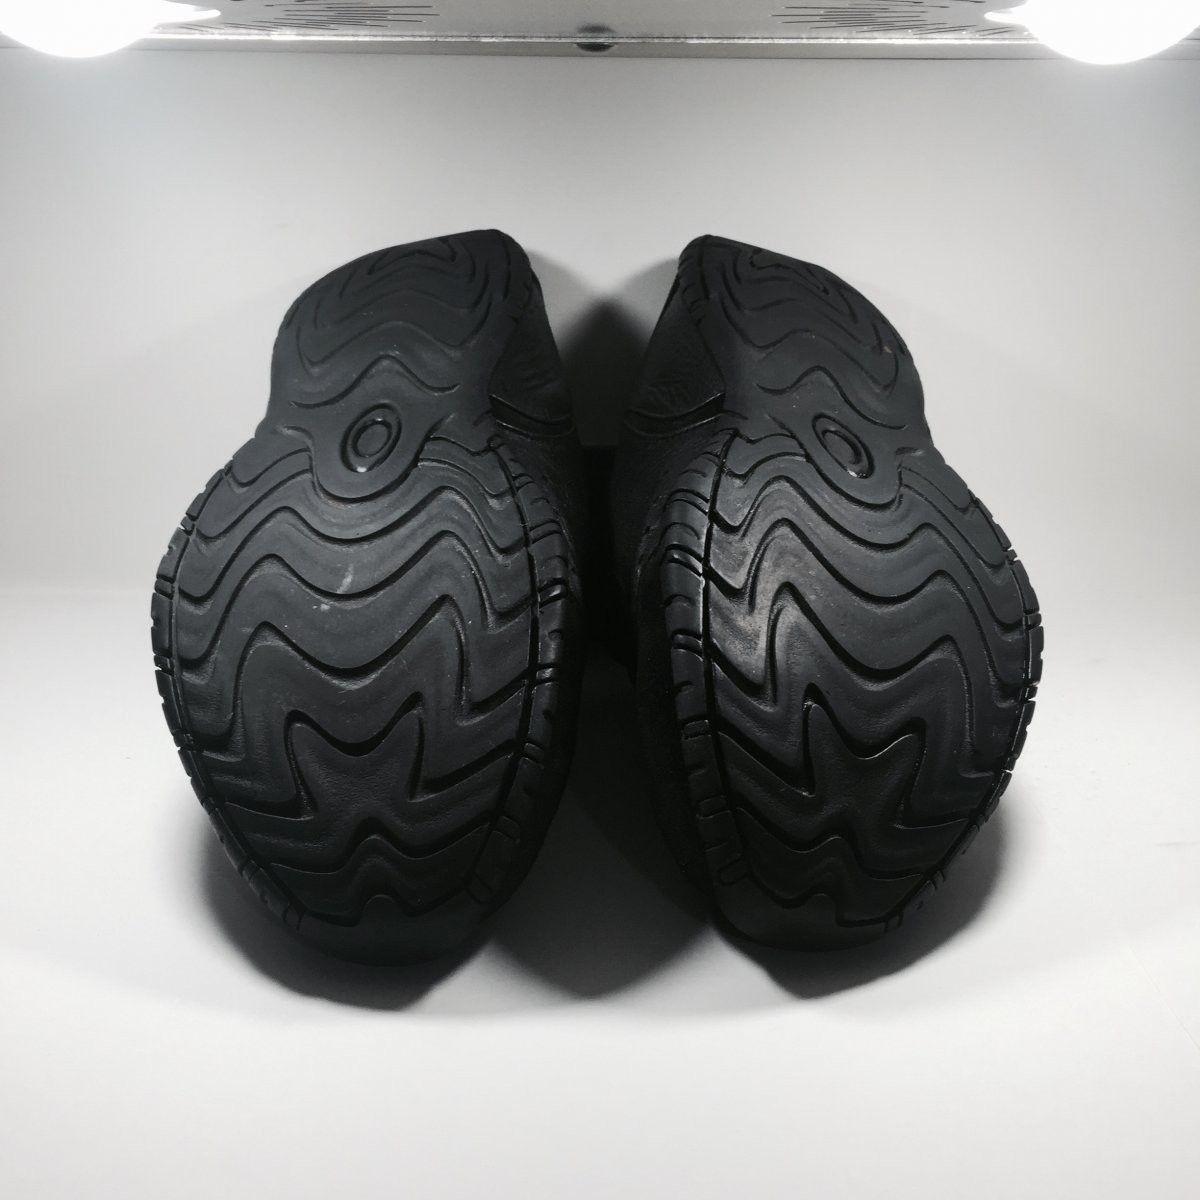 Oakley Shoes Size 12.5 Original Rip Cords Black/Chrome - Oakley Rip Cord Black Chrome (5).jpg